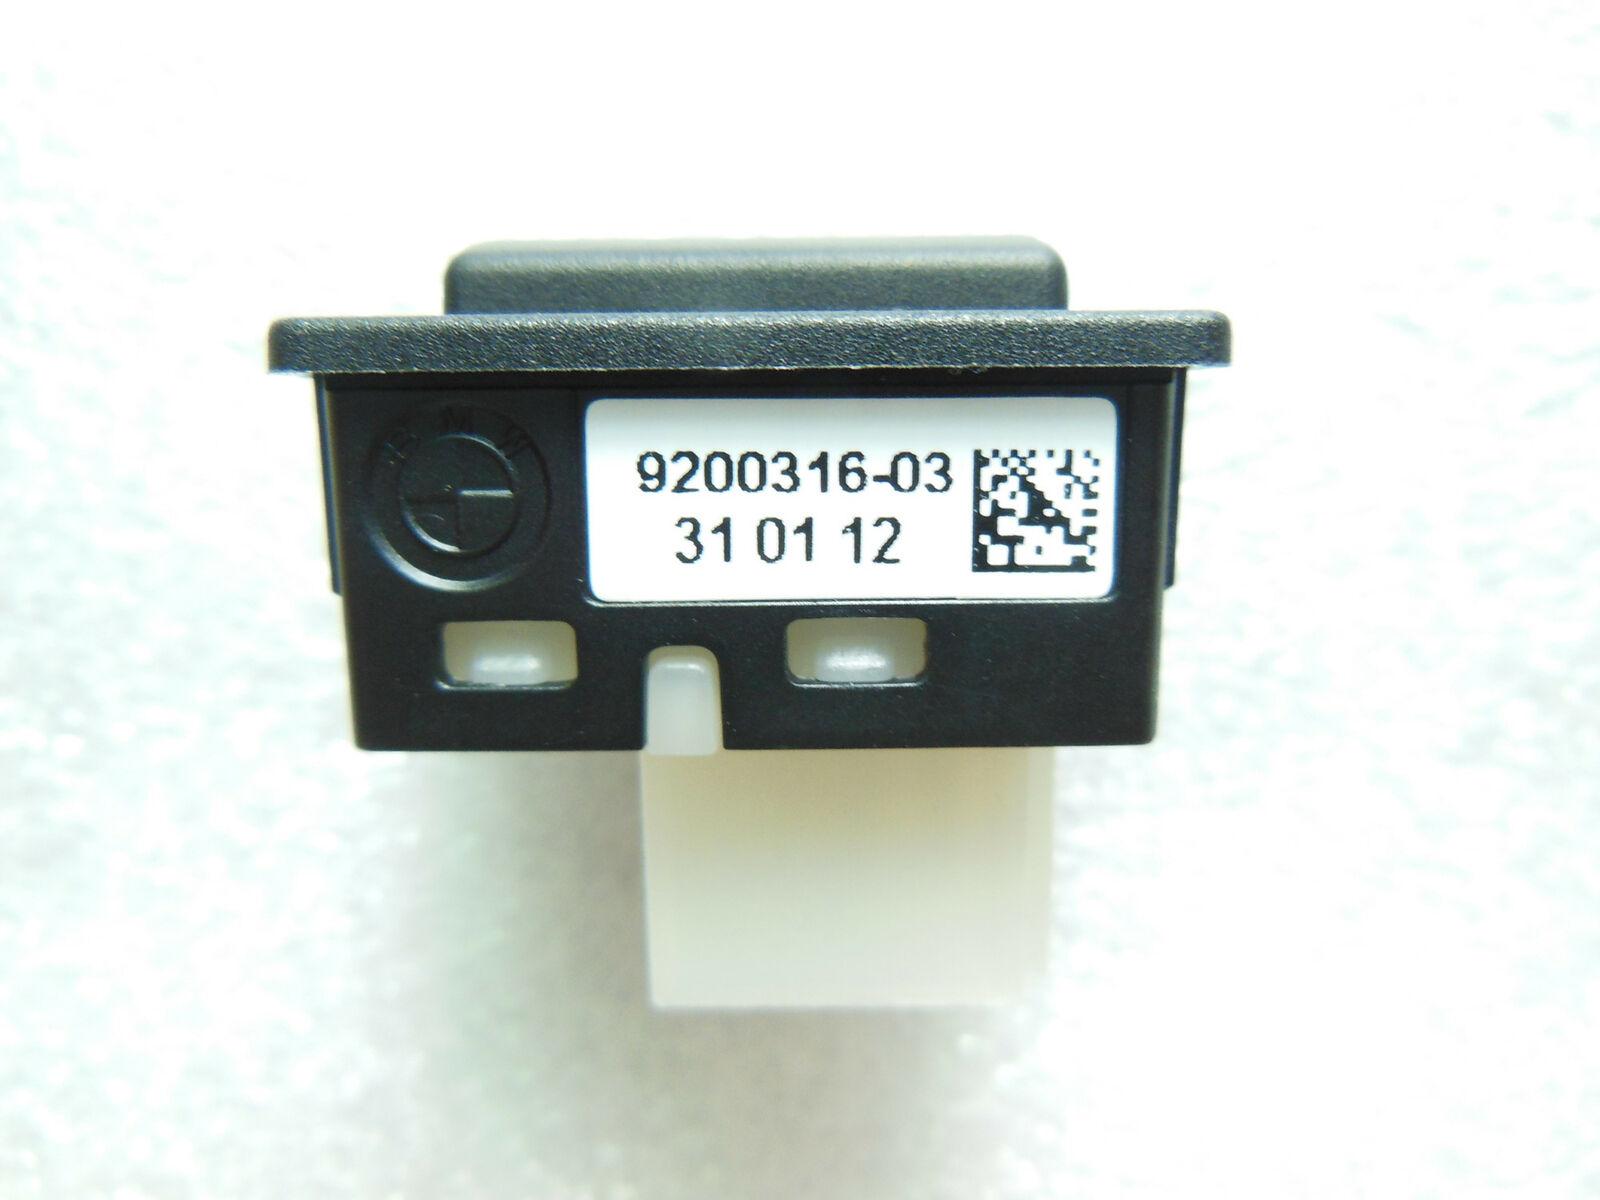 Oem Trunk Unlocking Switch Button  U0026 Harness For Bmw F20